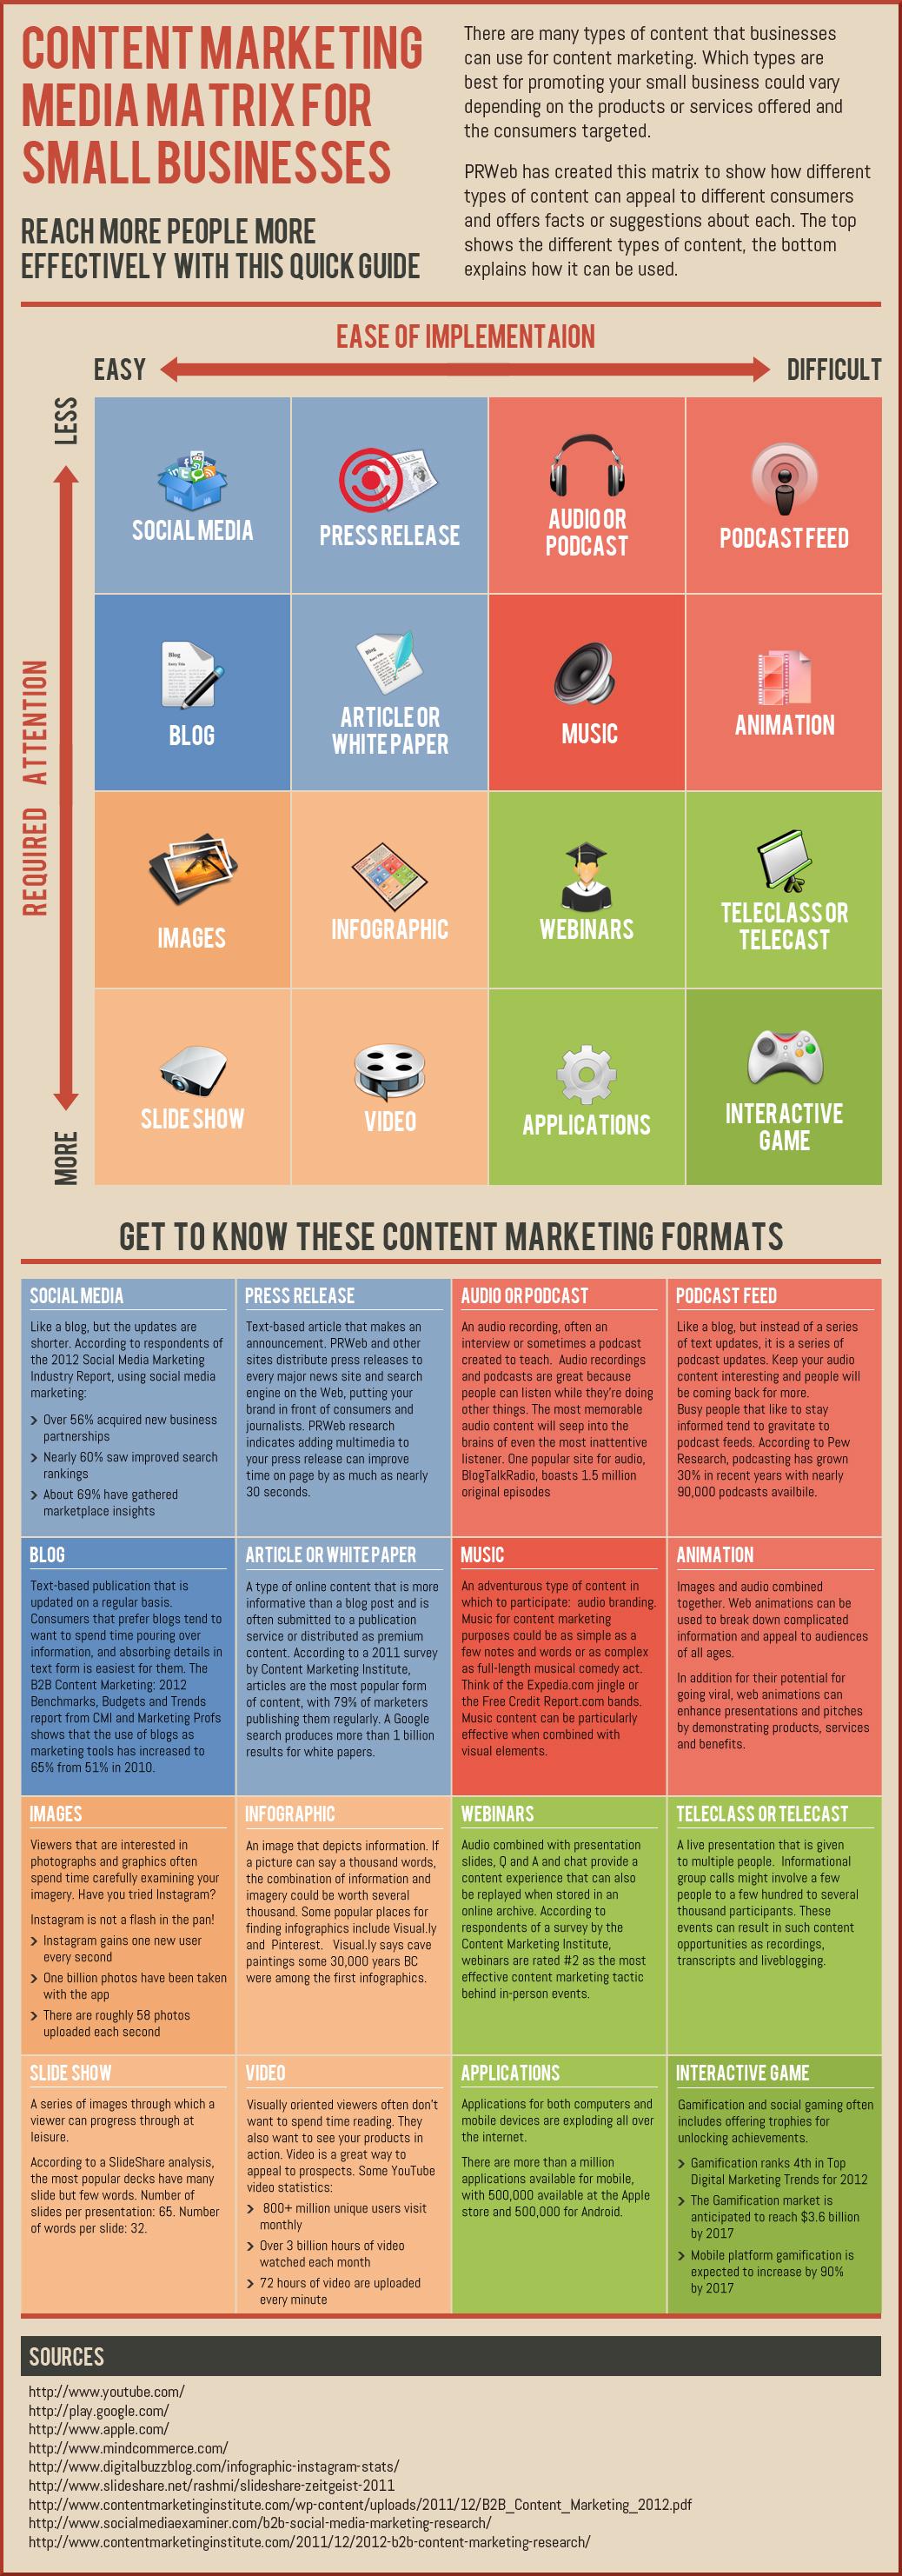 Content marketing media matrix for small businesses | # ...